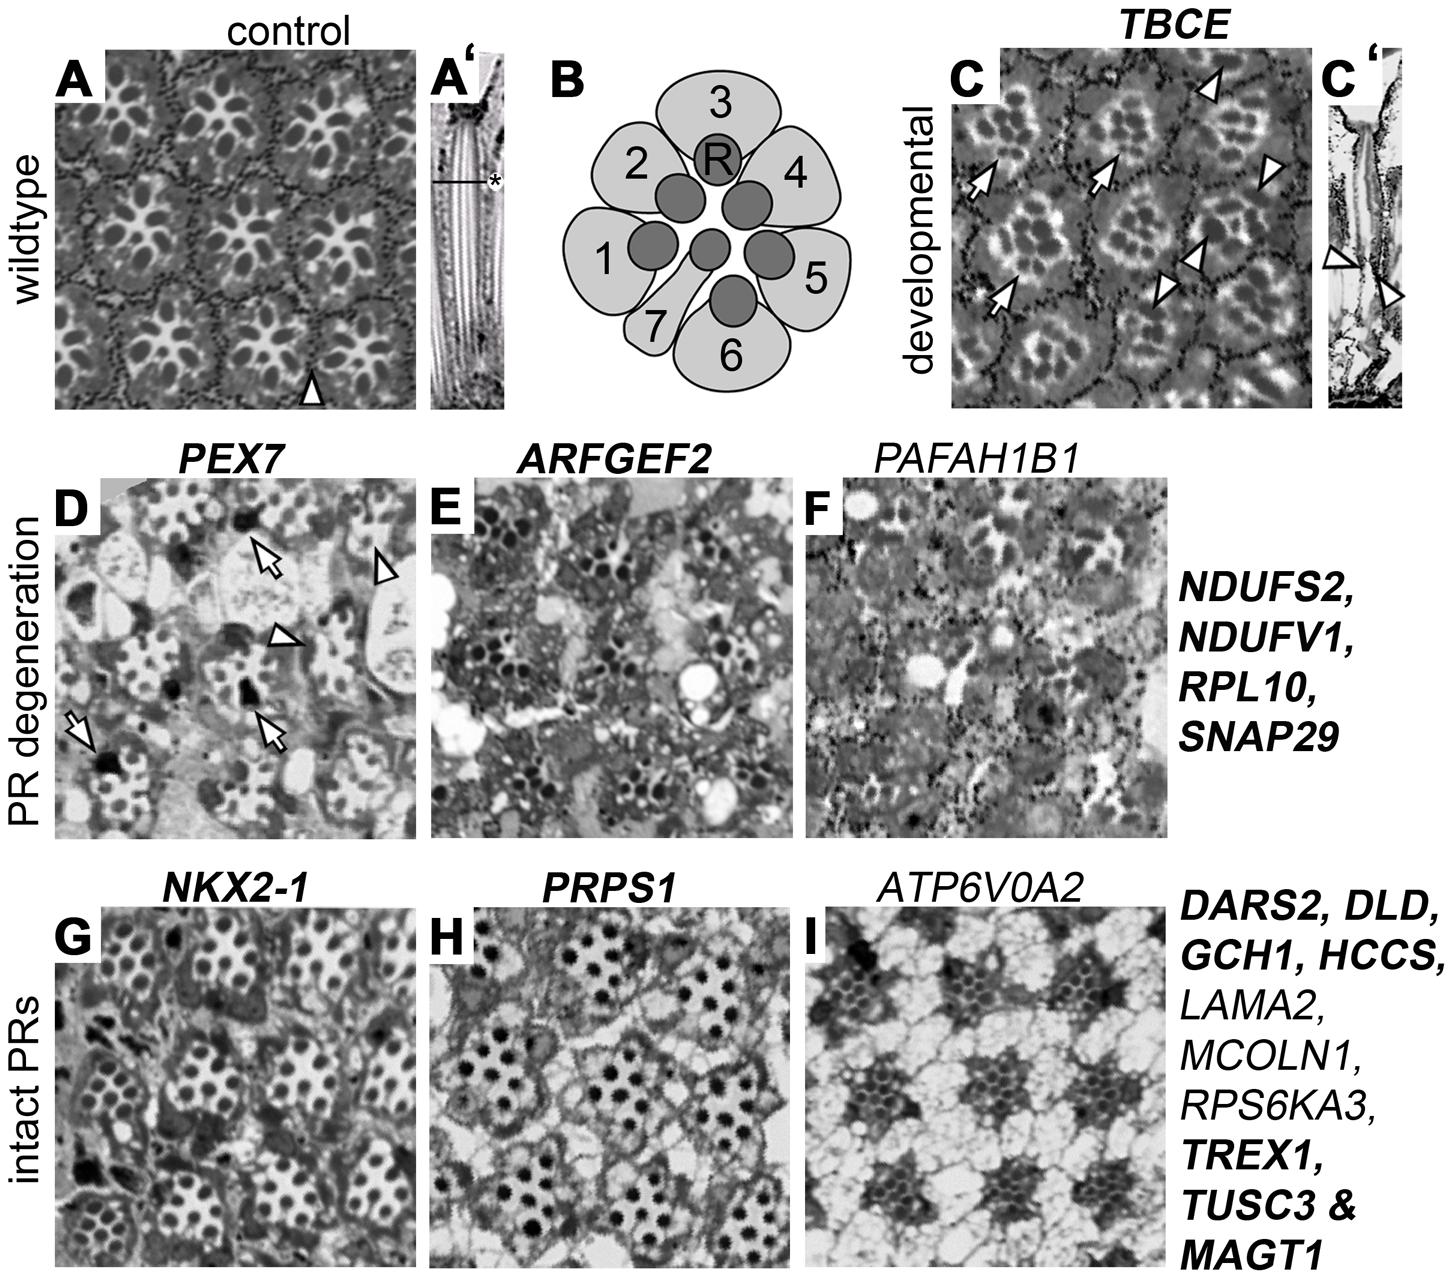 Histological analysis of <i>Drosophila</i> ID gene knockdown eyes with ERG defects.